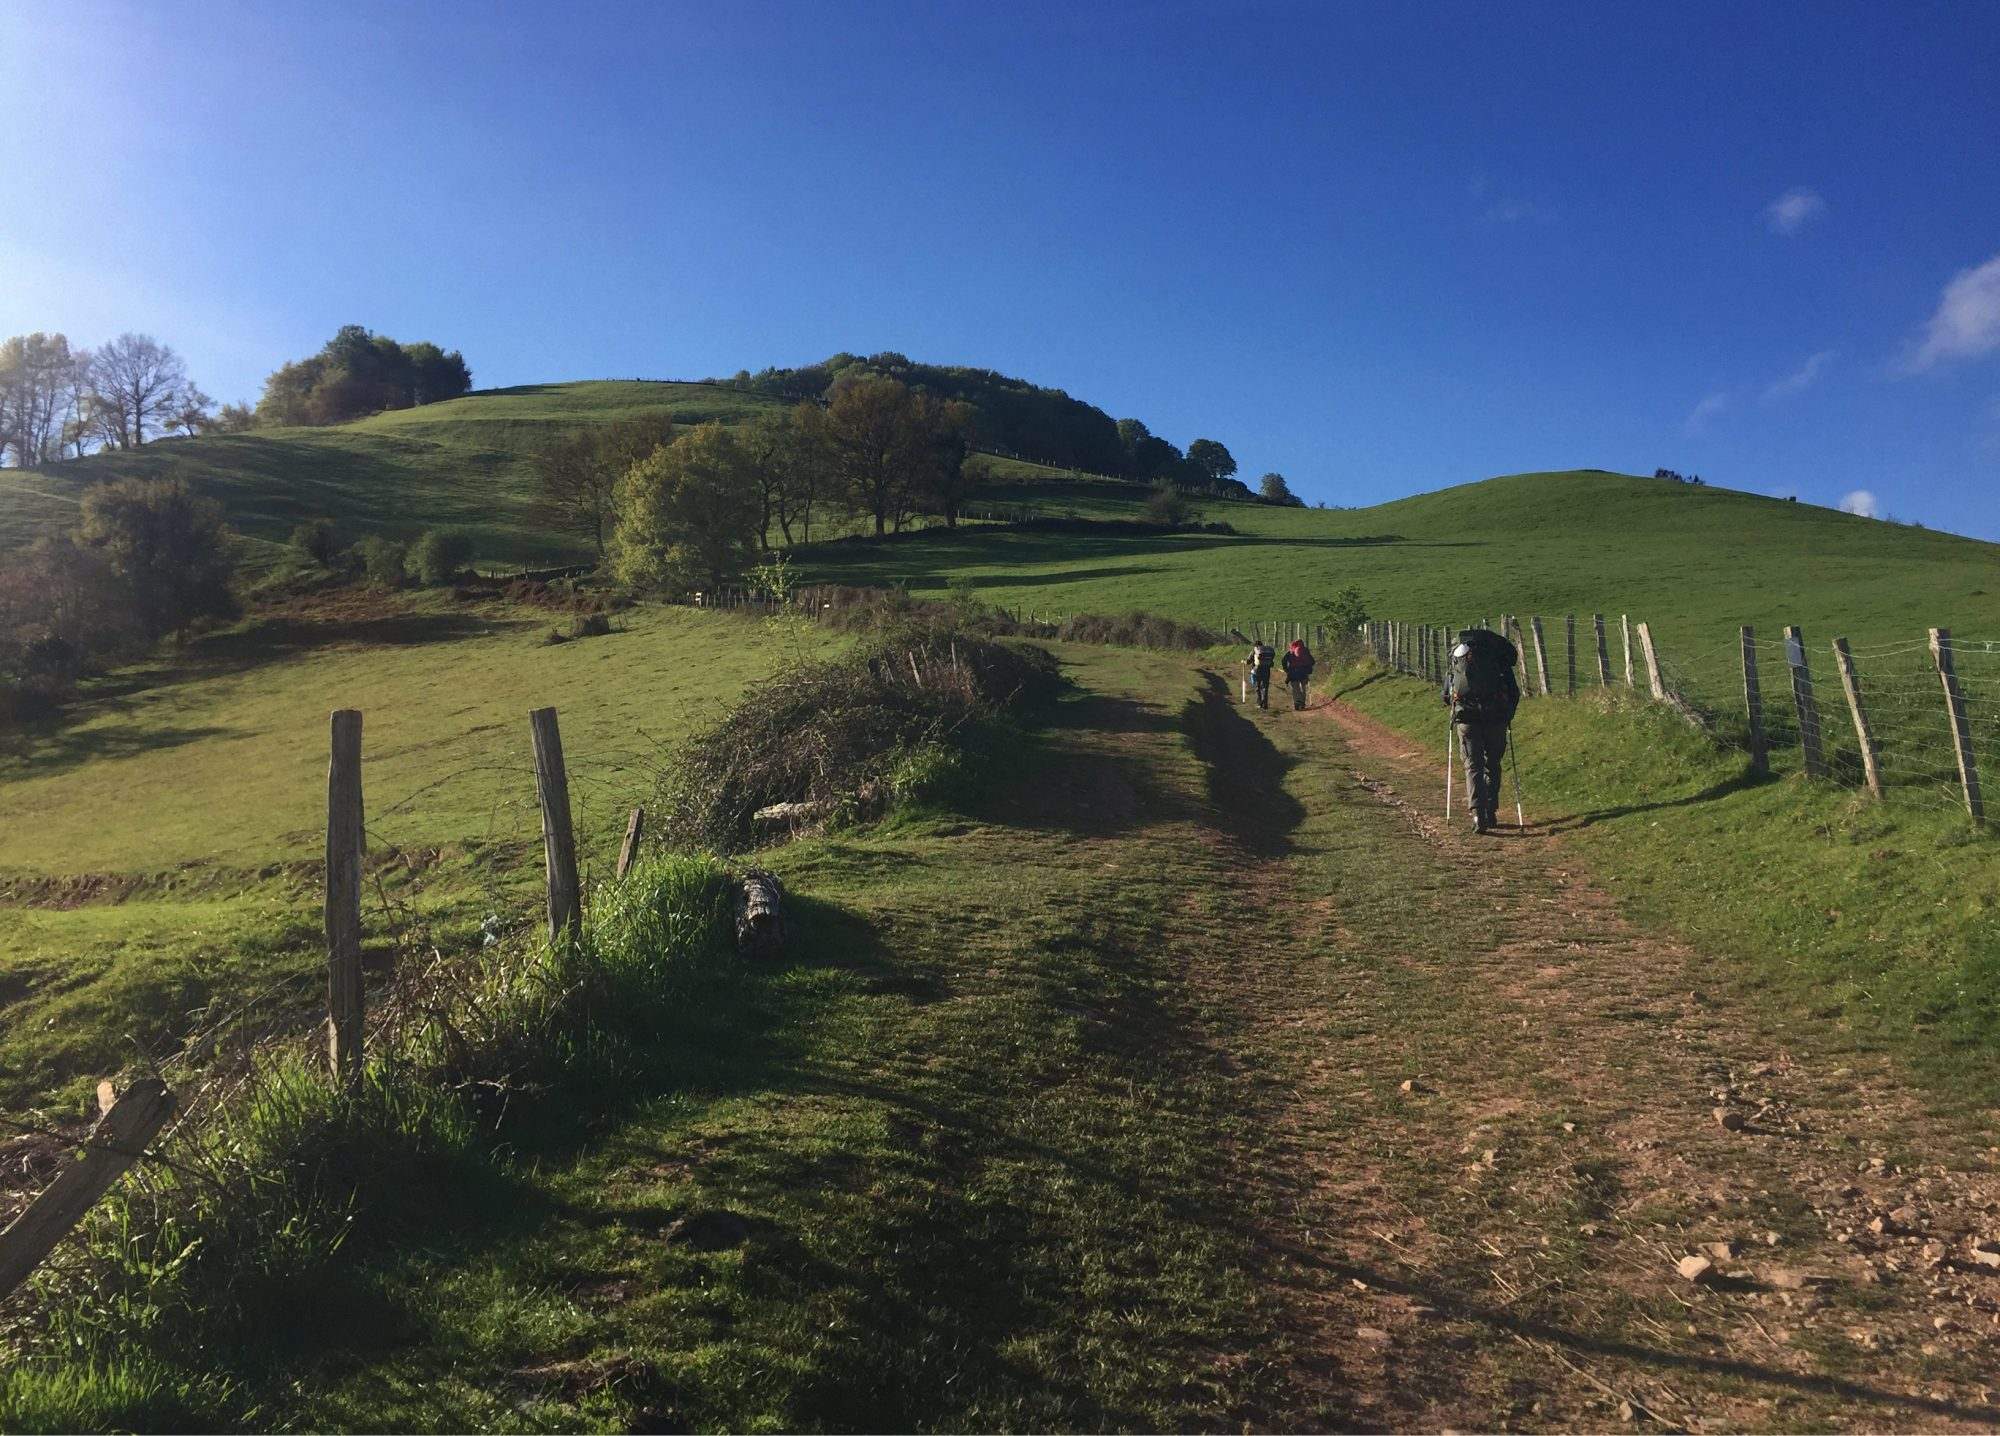 Rauf geht's auf den Ibaneta Pass, Camino Francés, Wandern, Wandertour, Pilgern, Jakobsweg, Pyrenäeen, Frankreich, Spanien